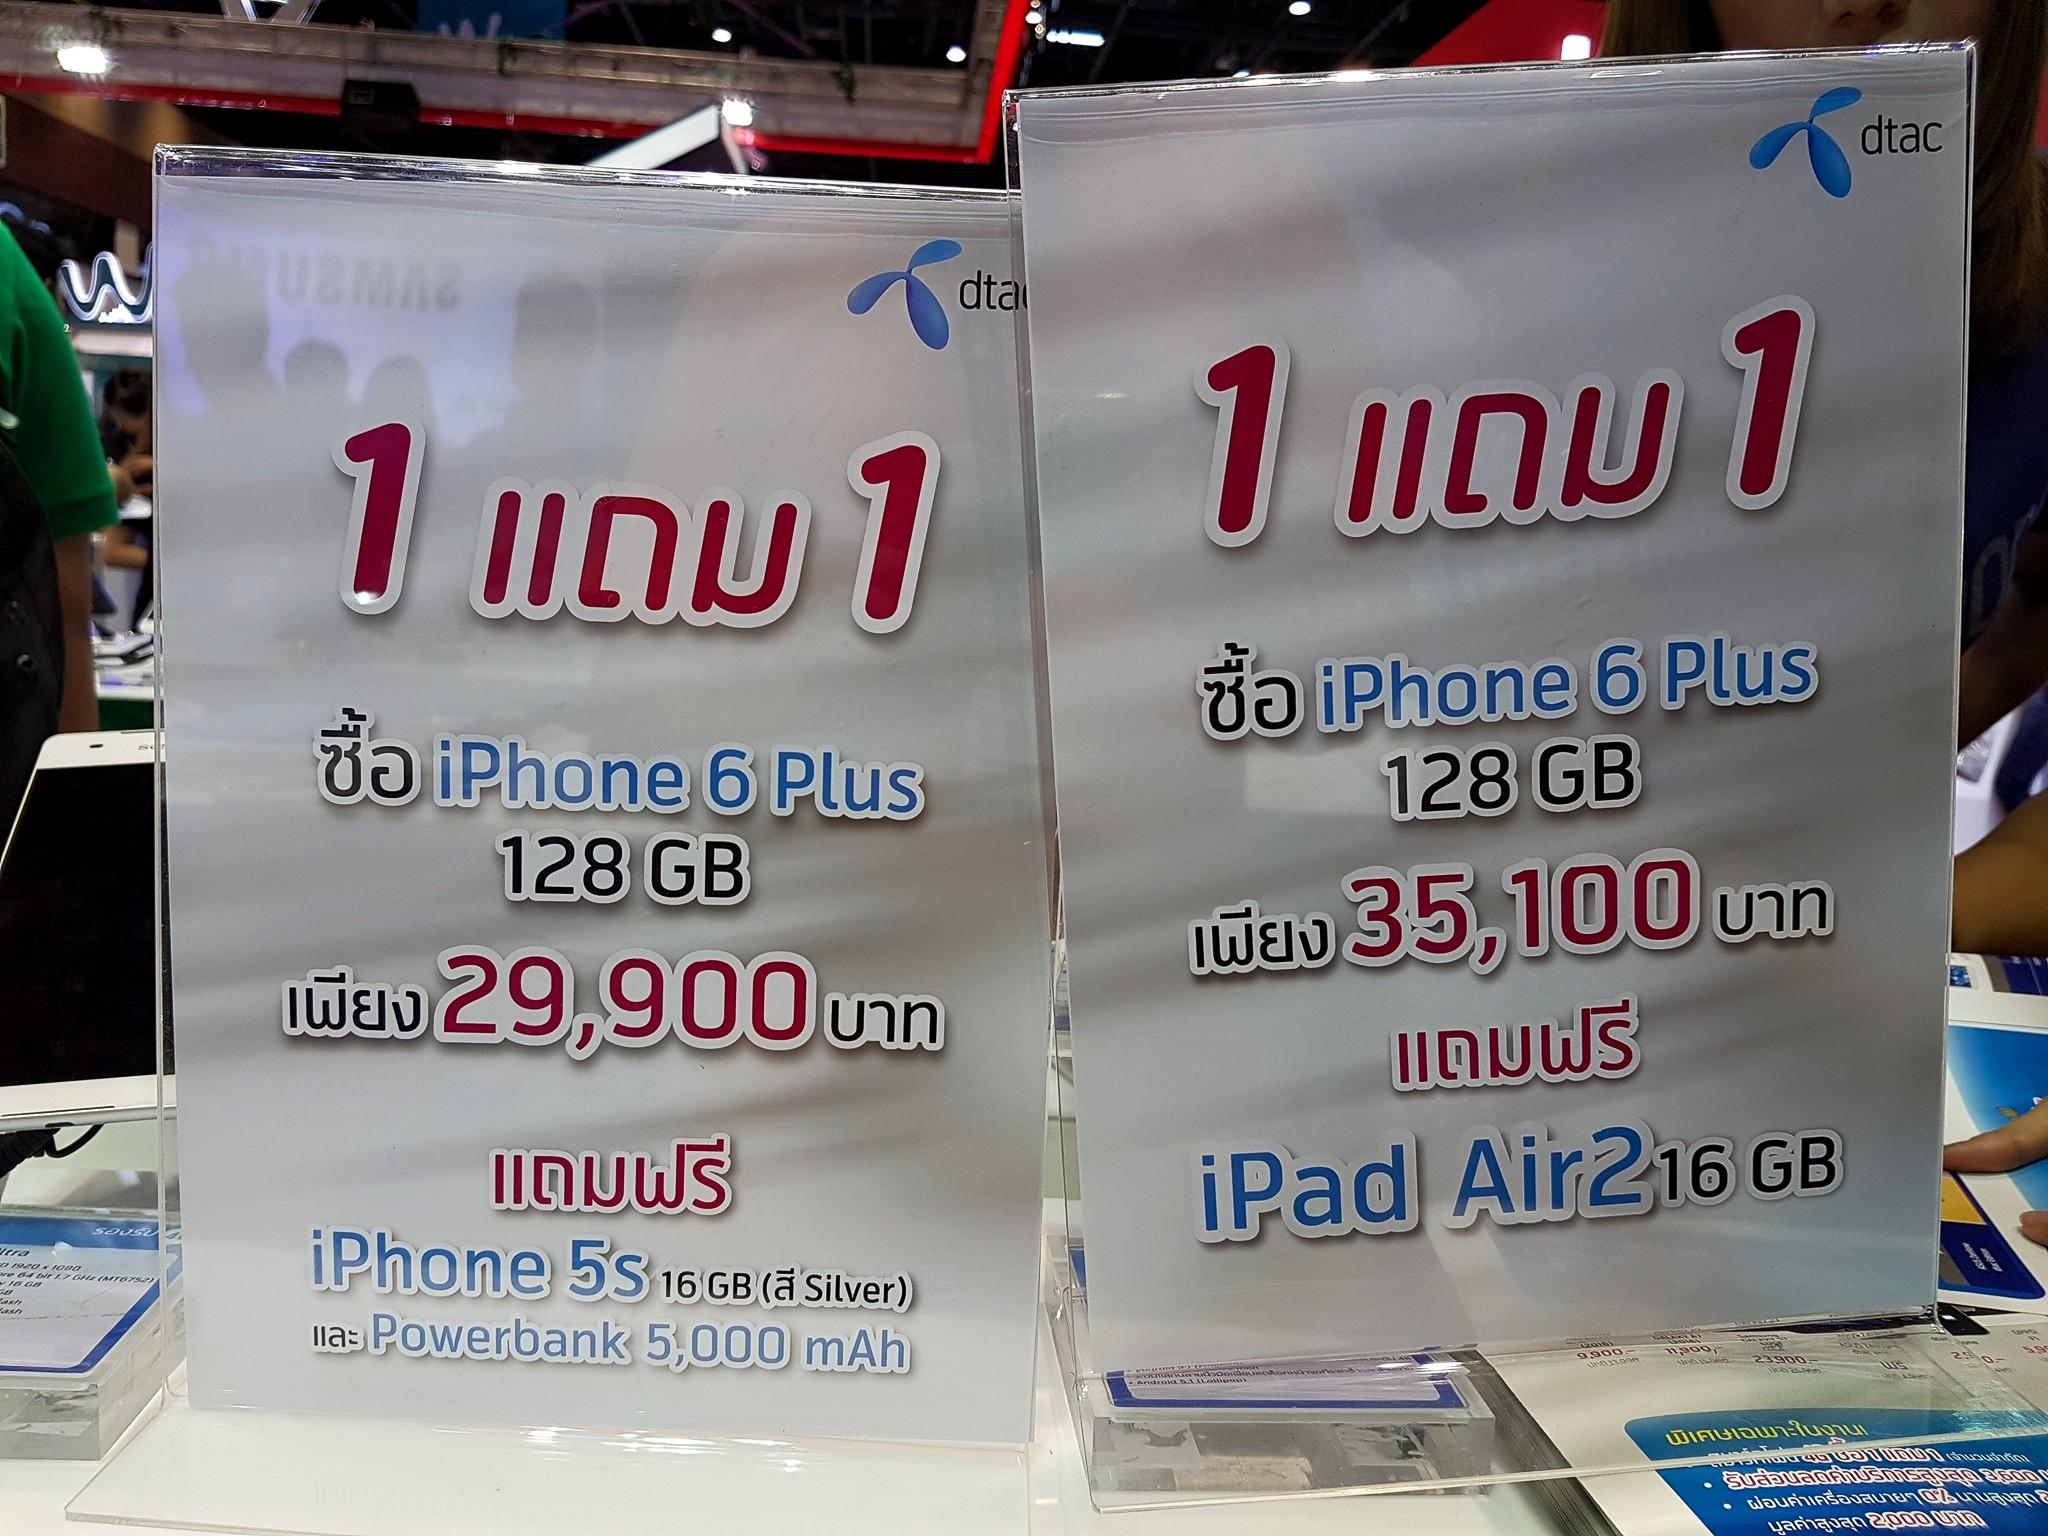 [TME 2016] จัดด่วนน!! dtac ใจป้ำแจก iPhone 5s และ iPad Air 2 เมื่อซื้อ iPhone 6 Plus ภายในงาน TME 2016 Hi-End